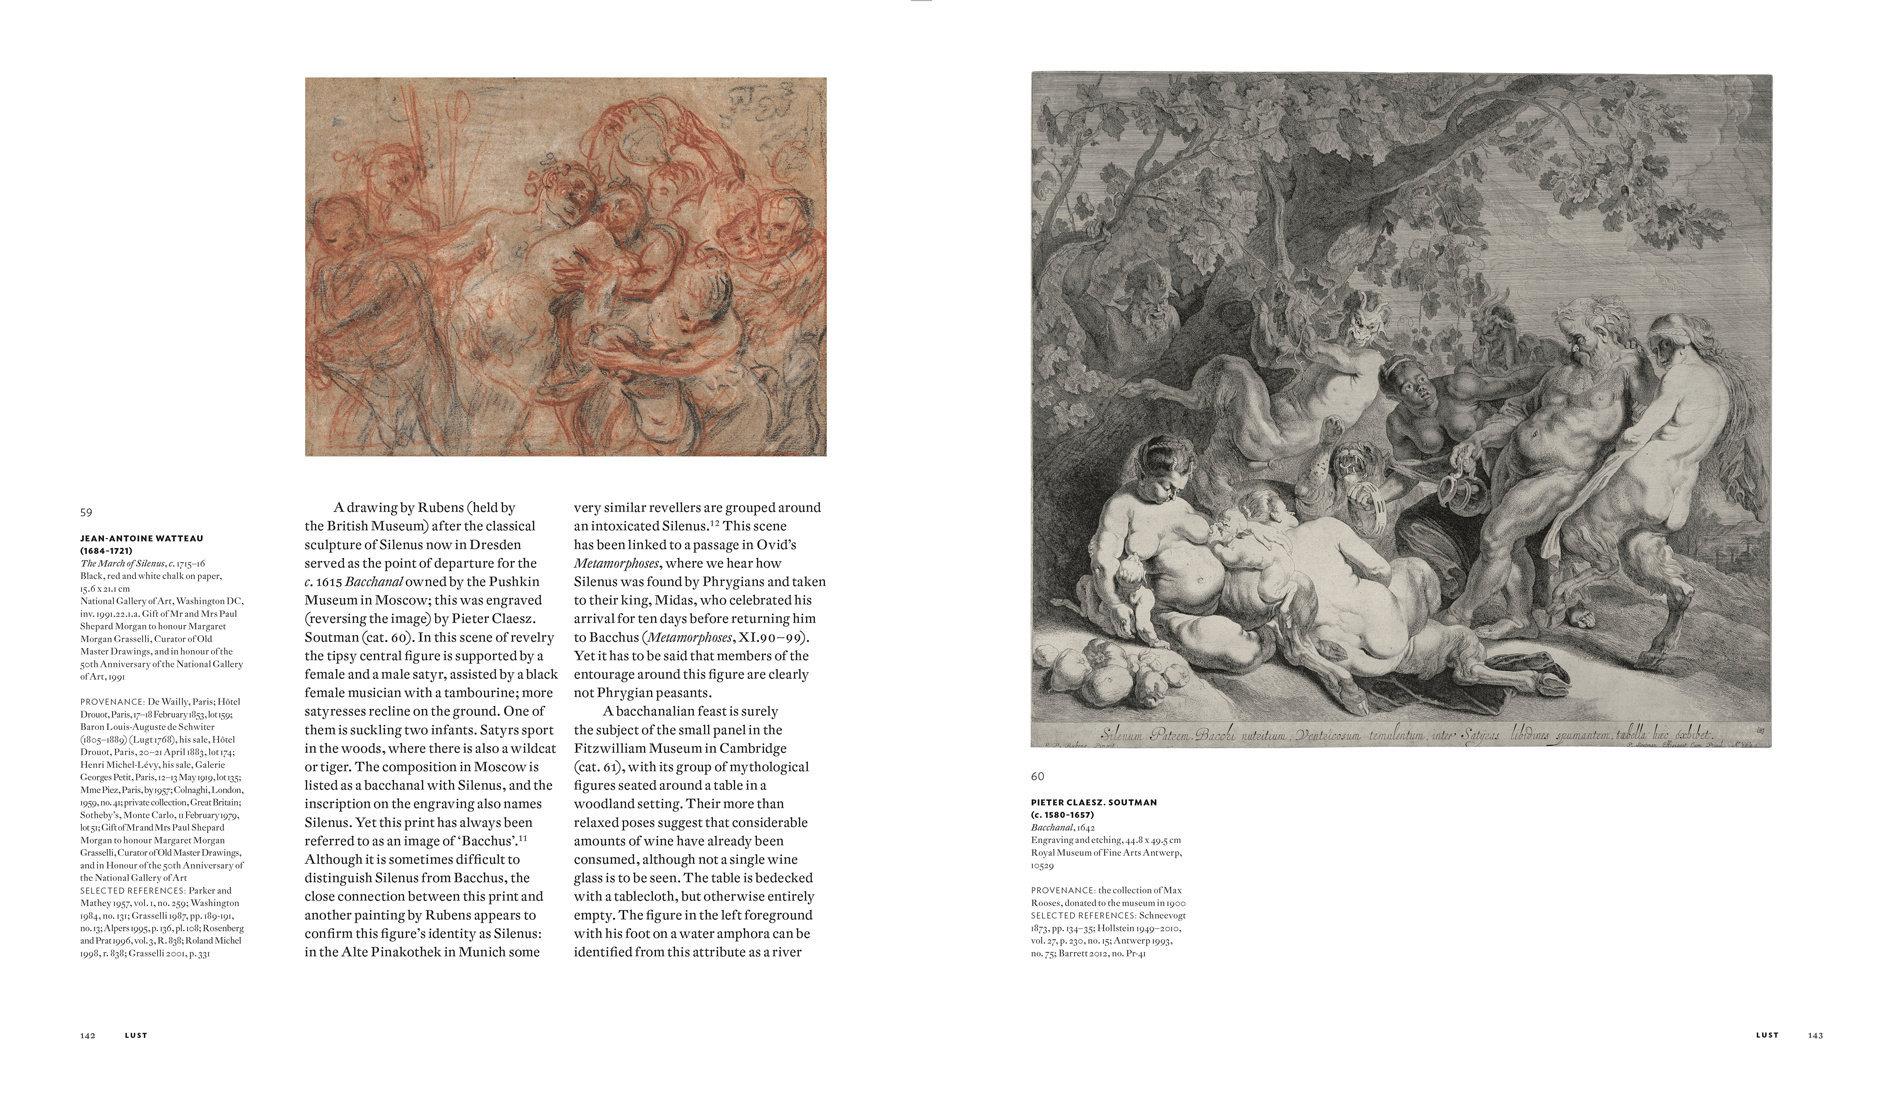 Rubens and his Legacy